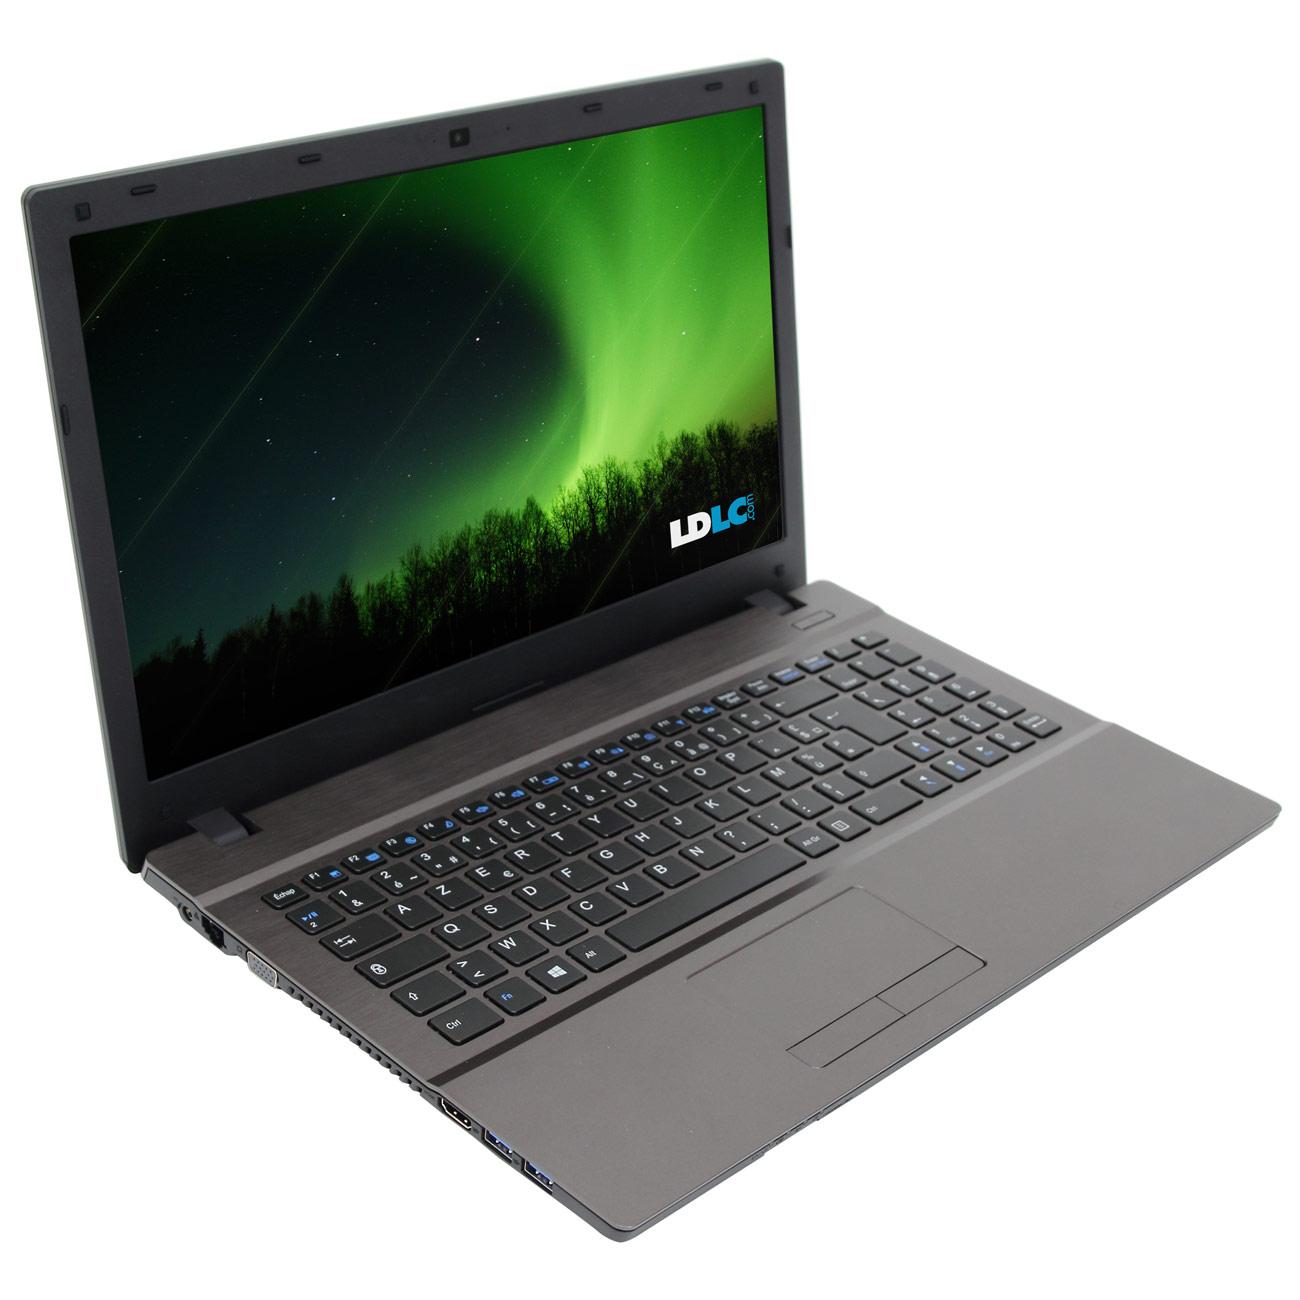 "PC portable LDLC Aurore BB5-I3-4-H5-H8 Slim Intel Core i3-2370M 4 Go 500 Go 15.6"" LED Graveur DVD Wi-Fi N/Bluetooth Webcam Windows 8.1 64 bits"